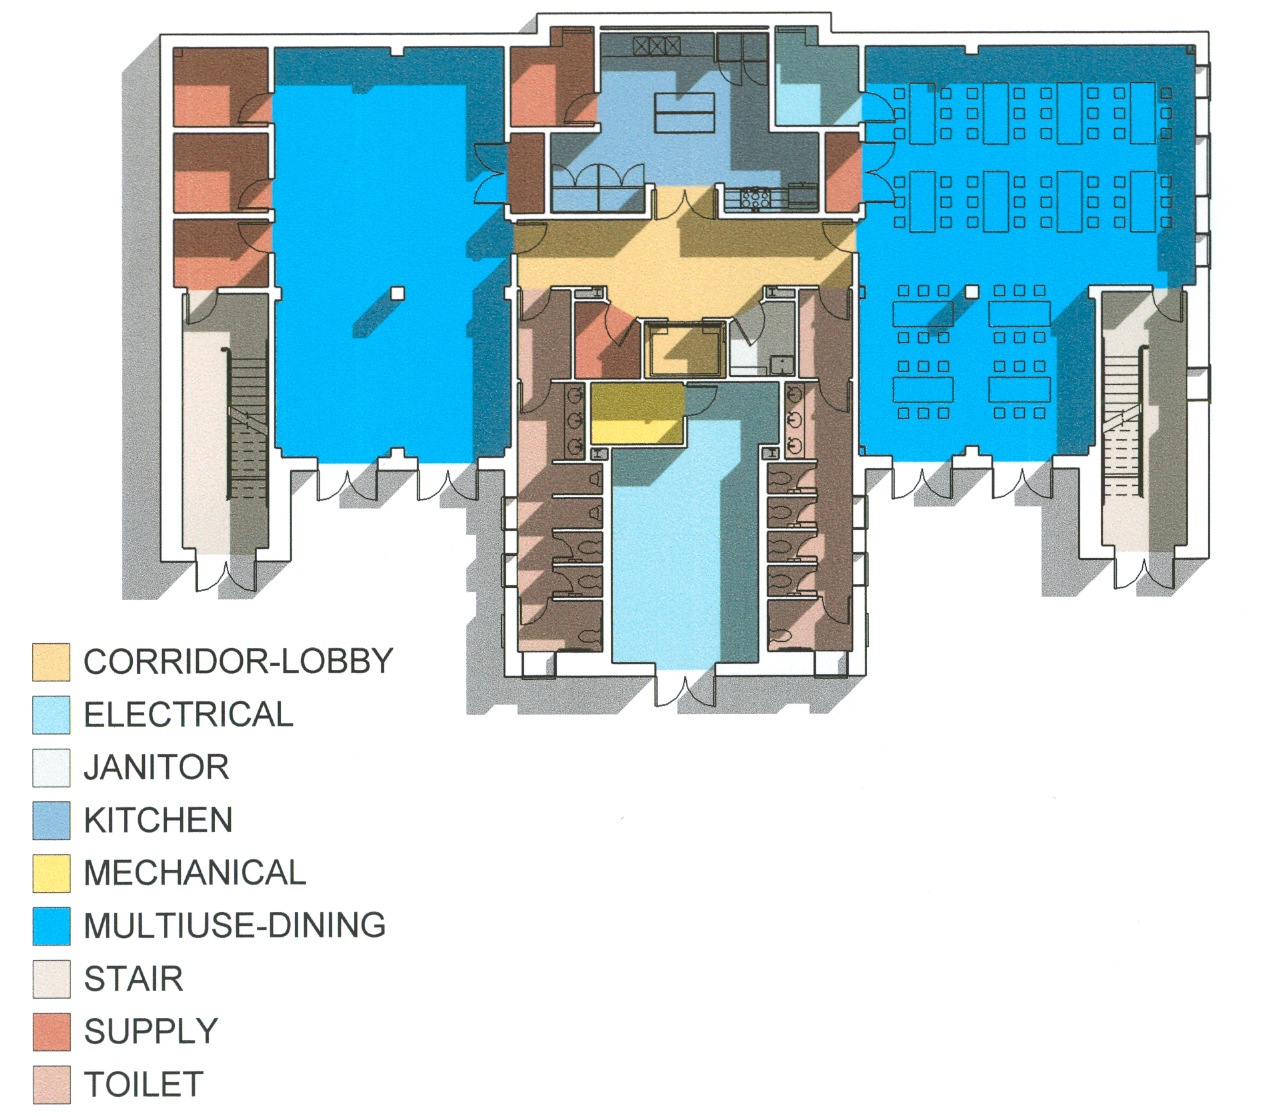 Kitchen & Dining - A E Pi Emory.jpg